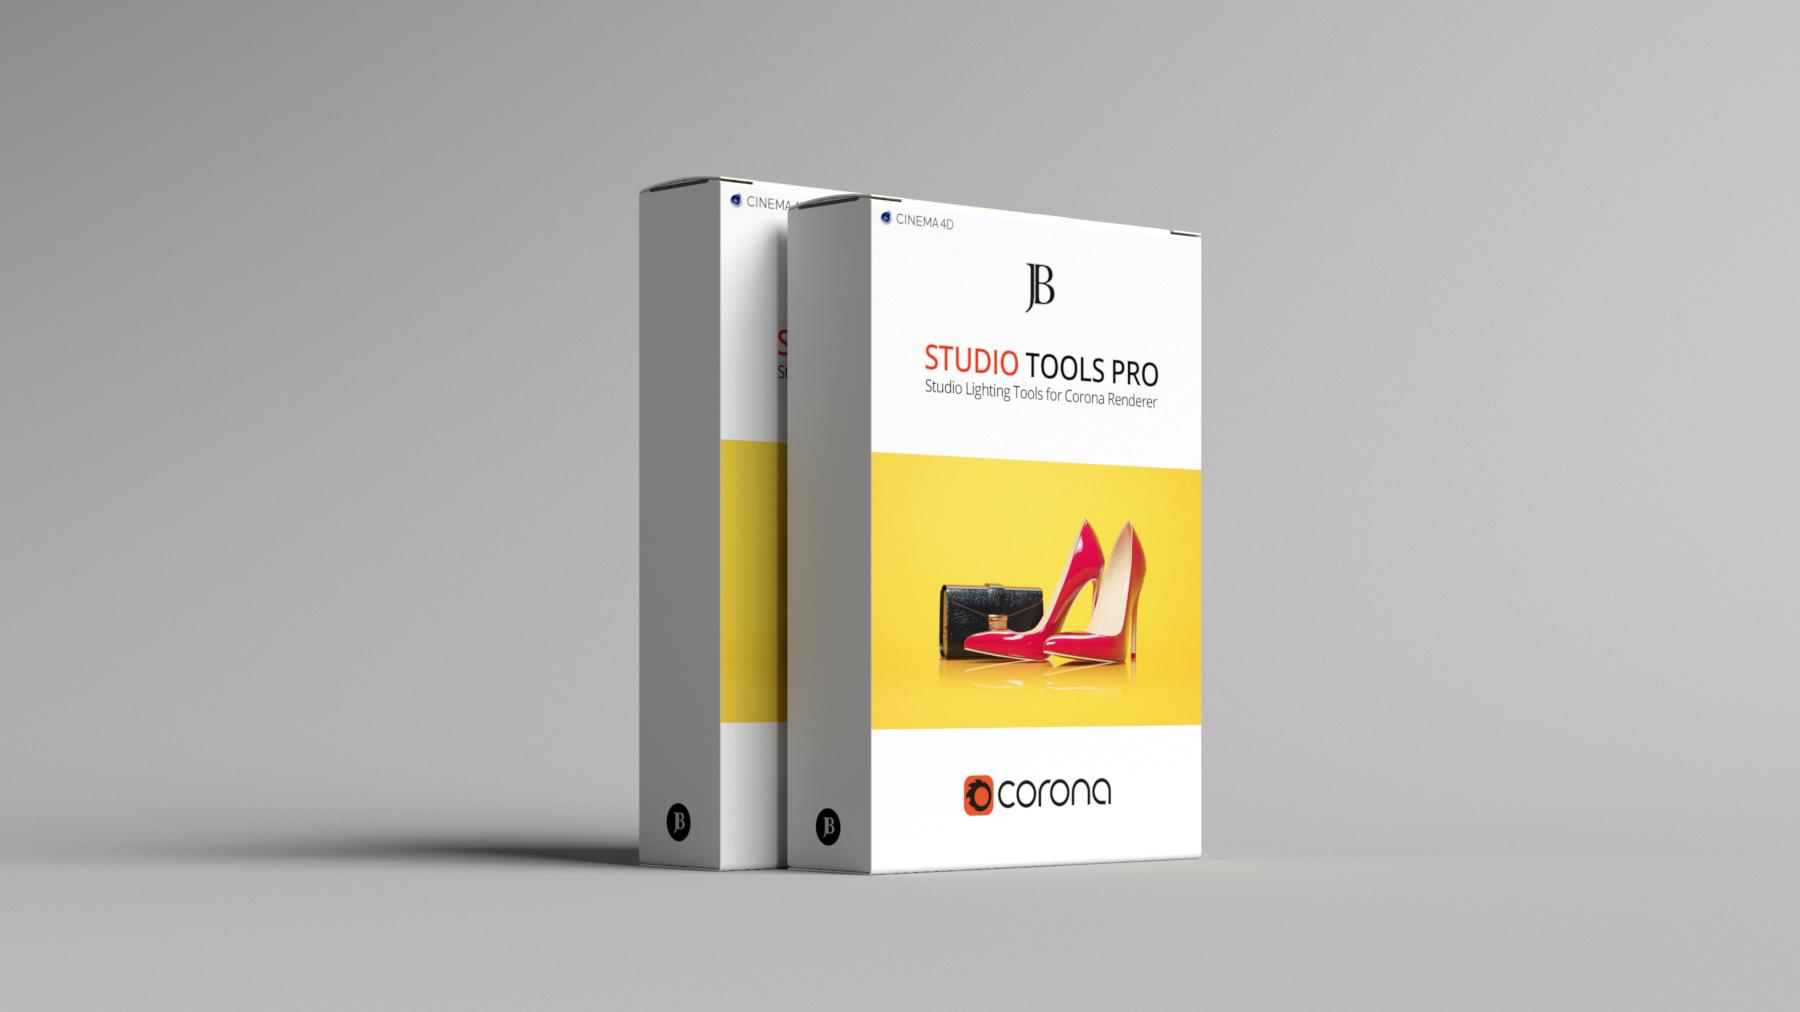 Corona Studio Tools Pro by Josef Bsharah